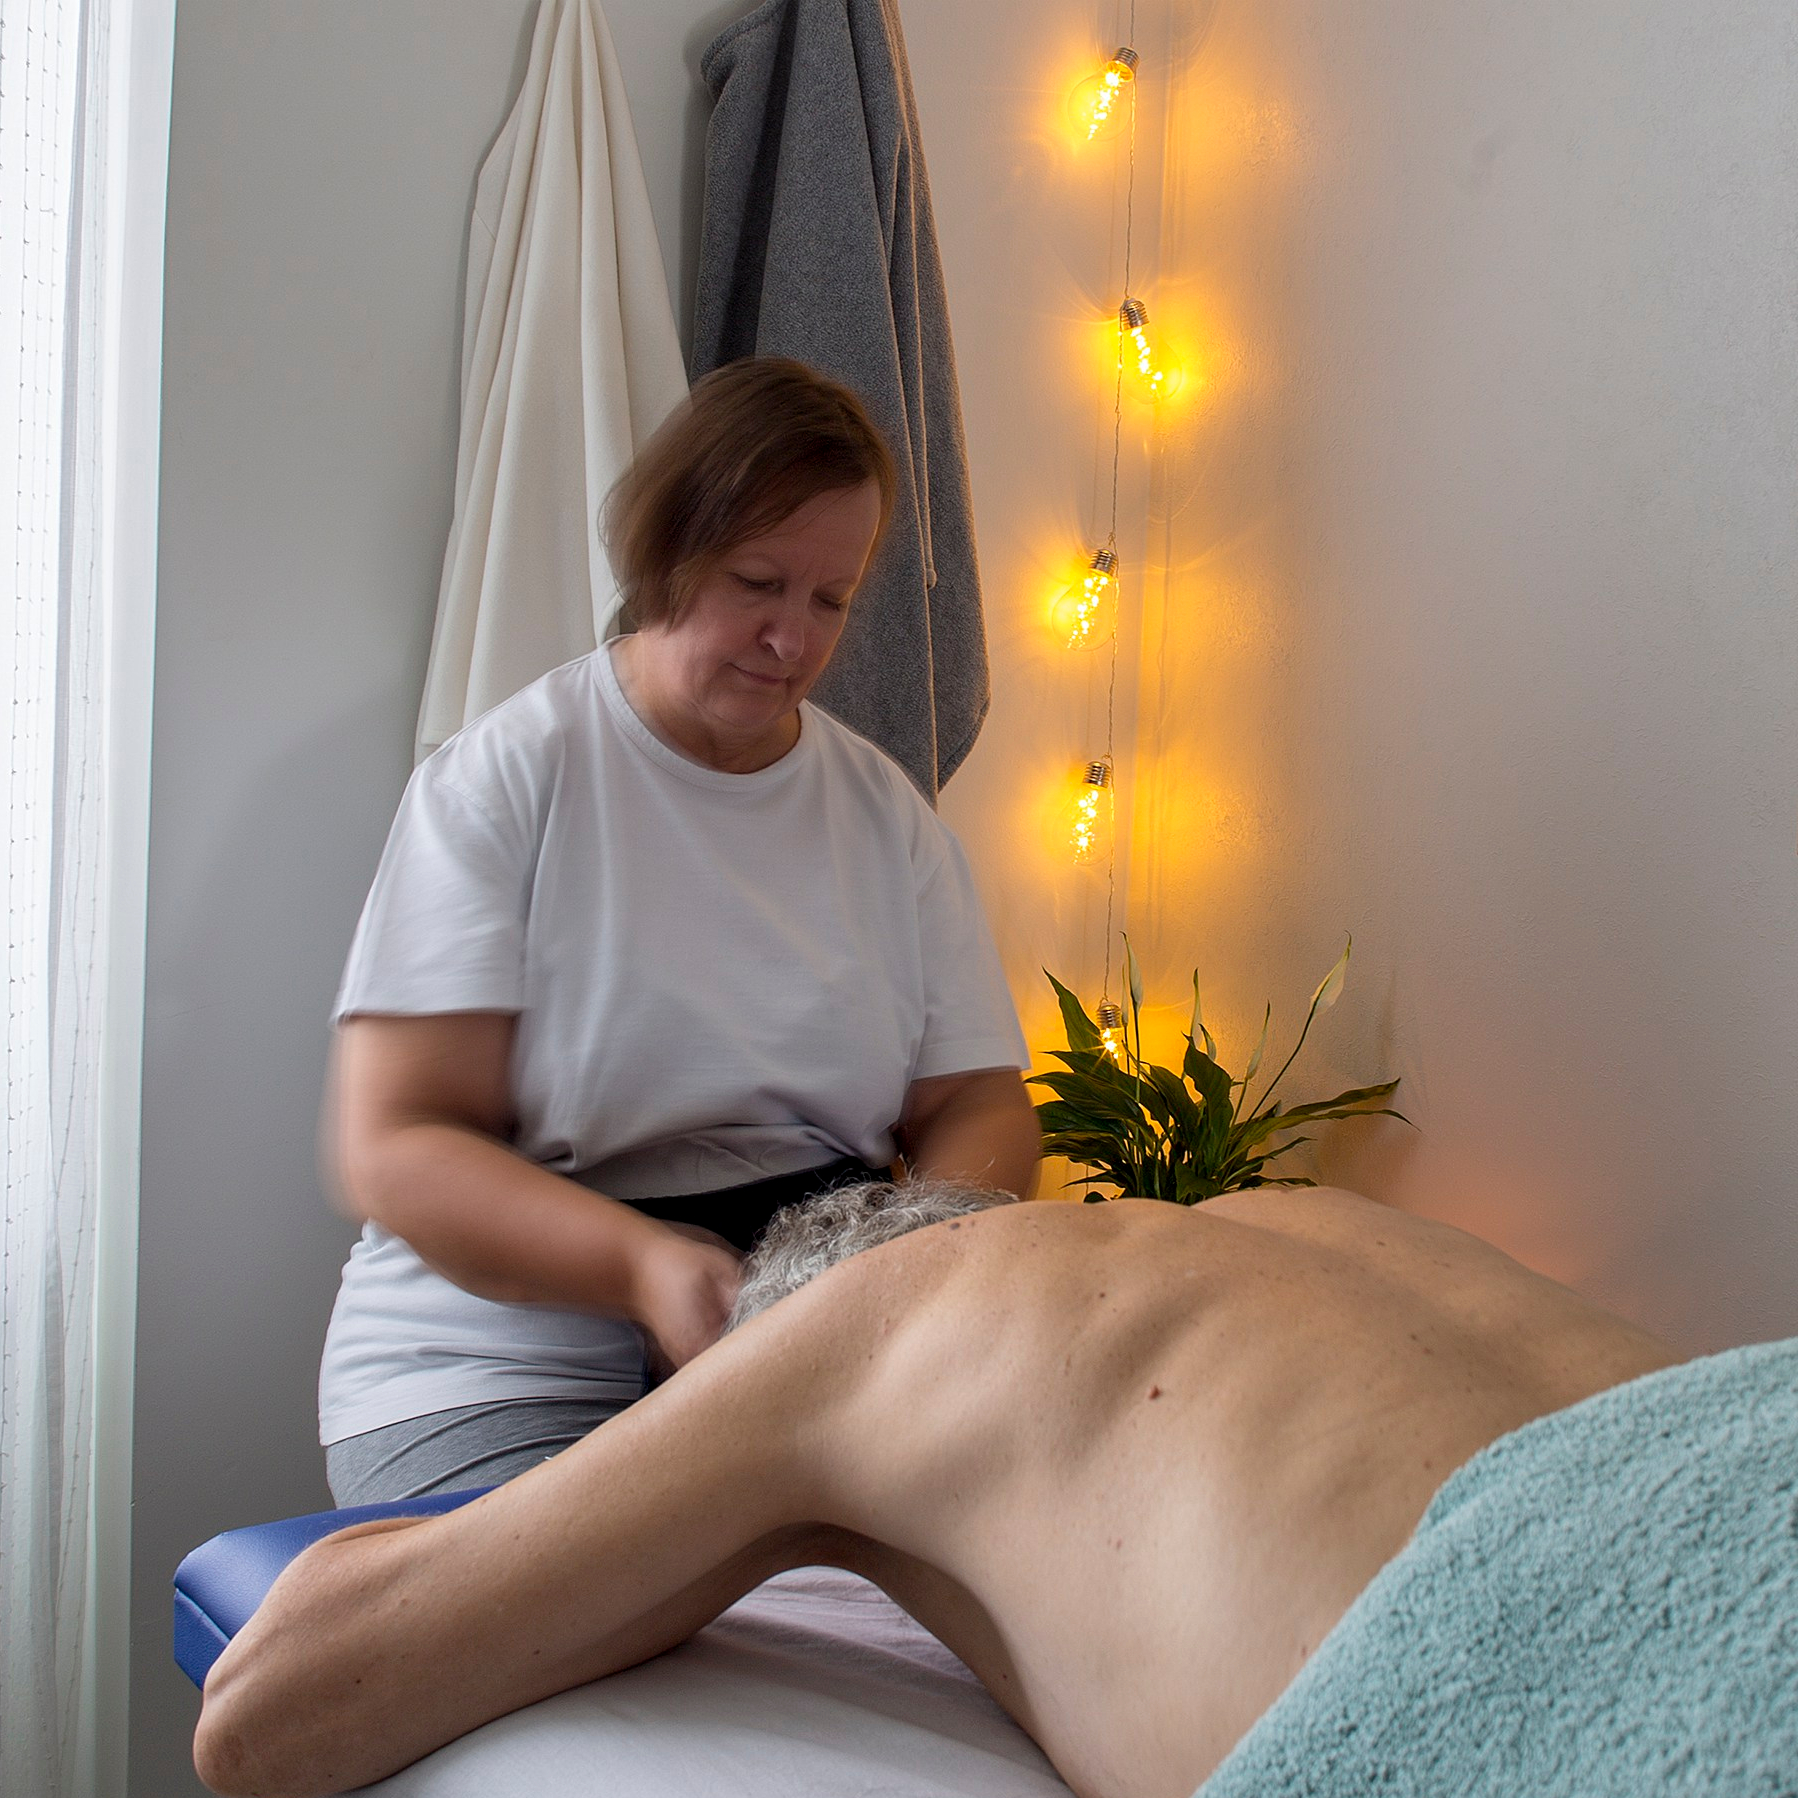 taktil massage händer hur gör man